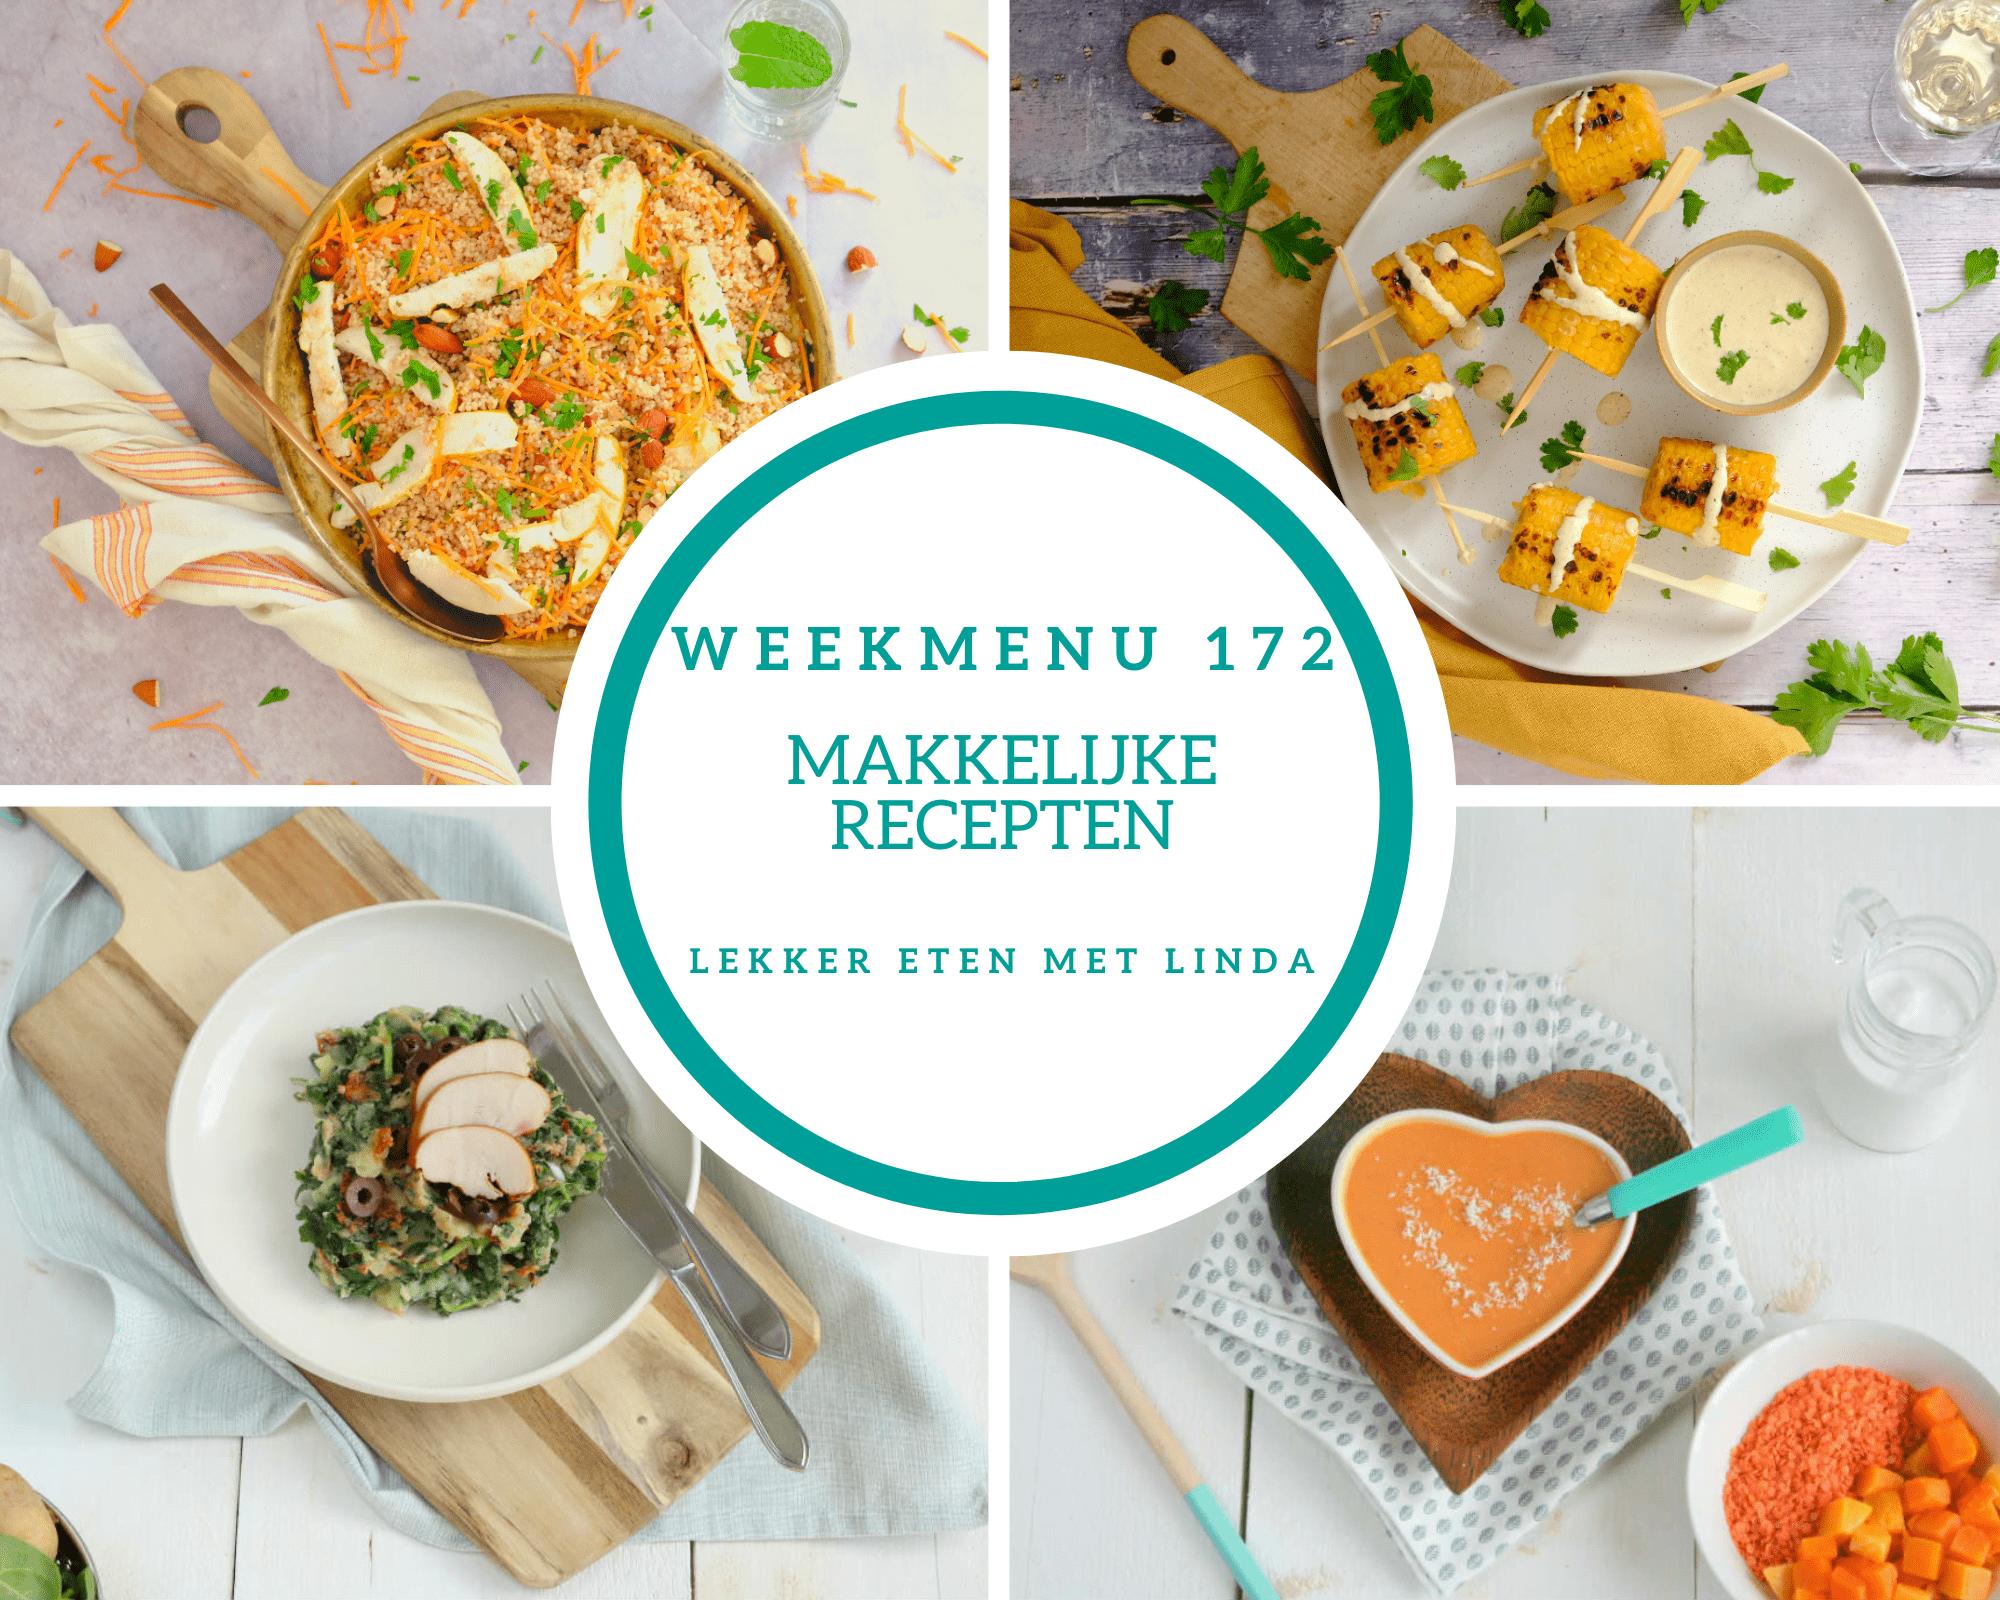 Weekmenu 172 makkelijke recepten